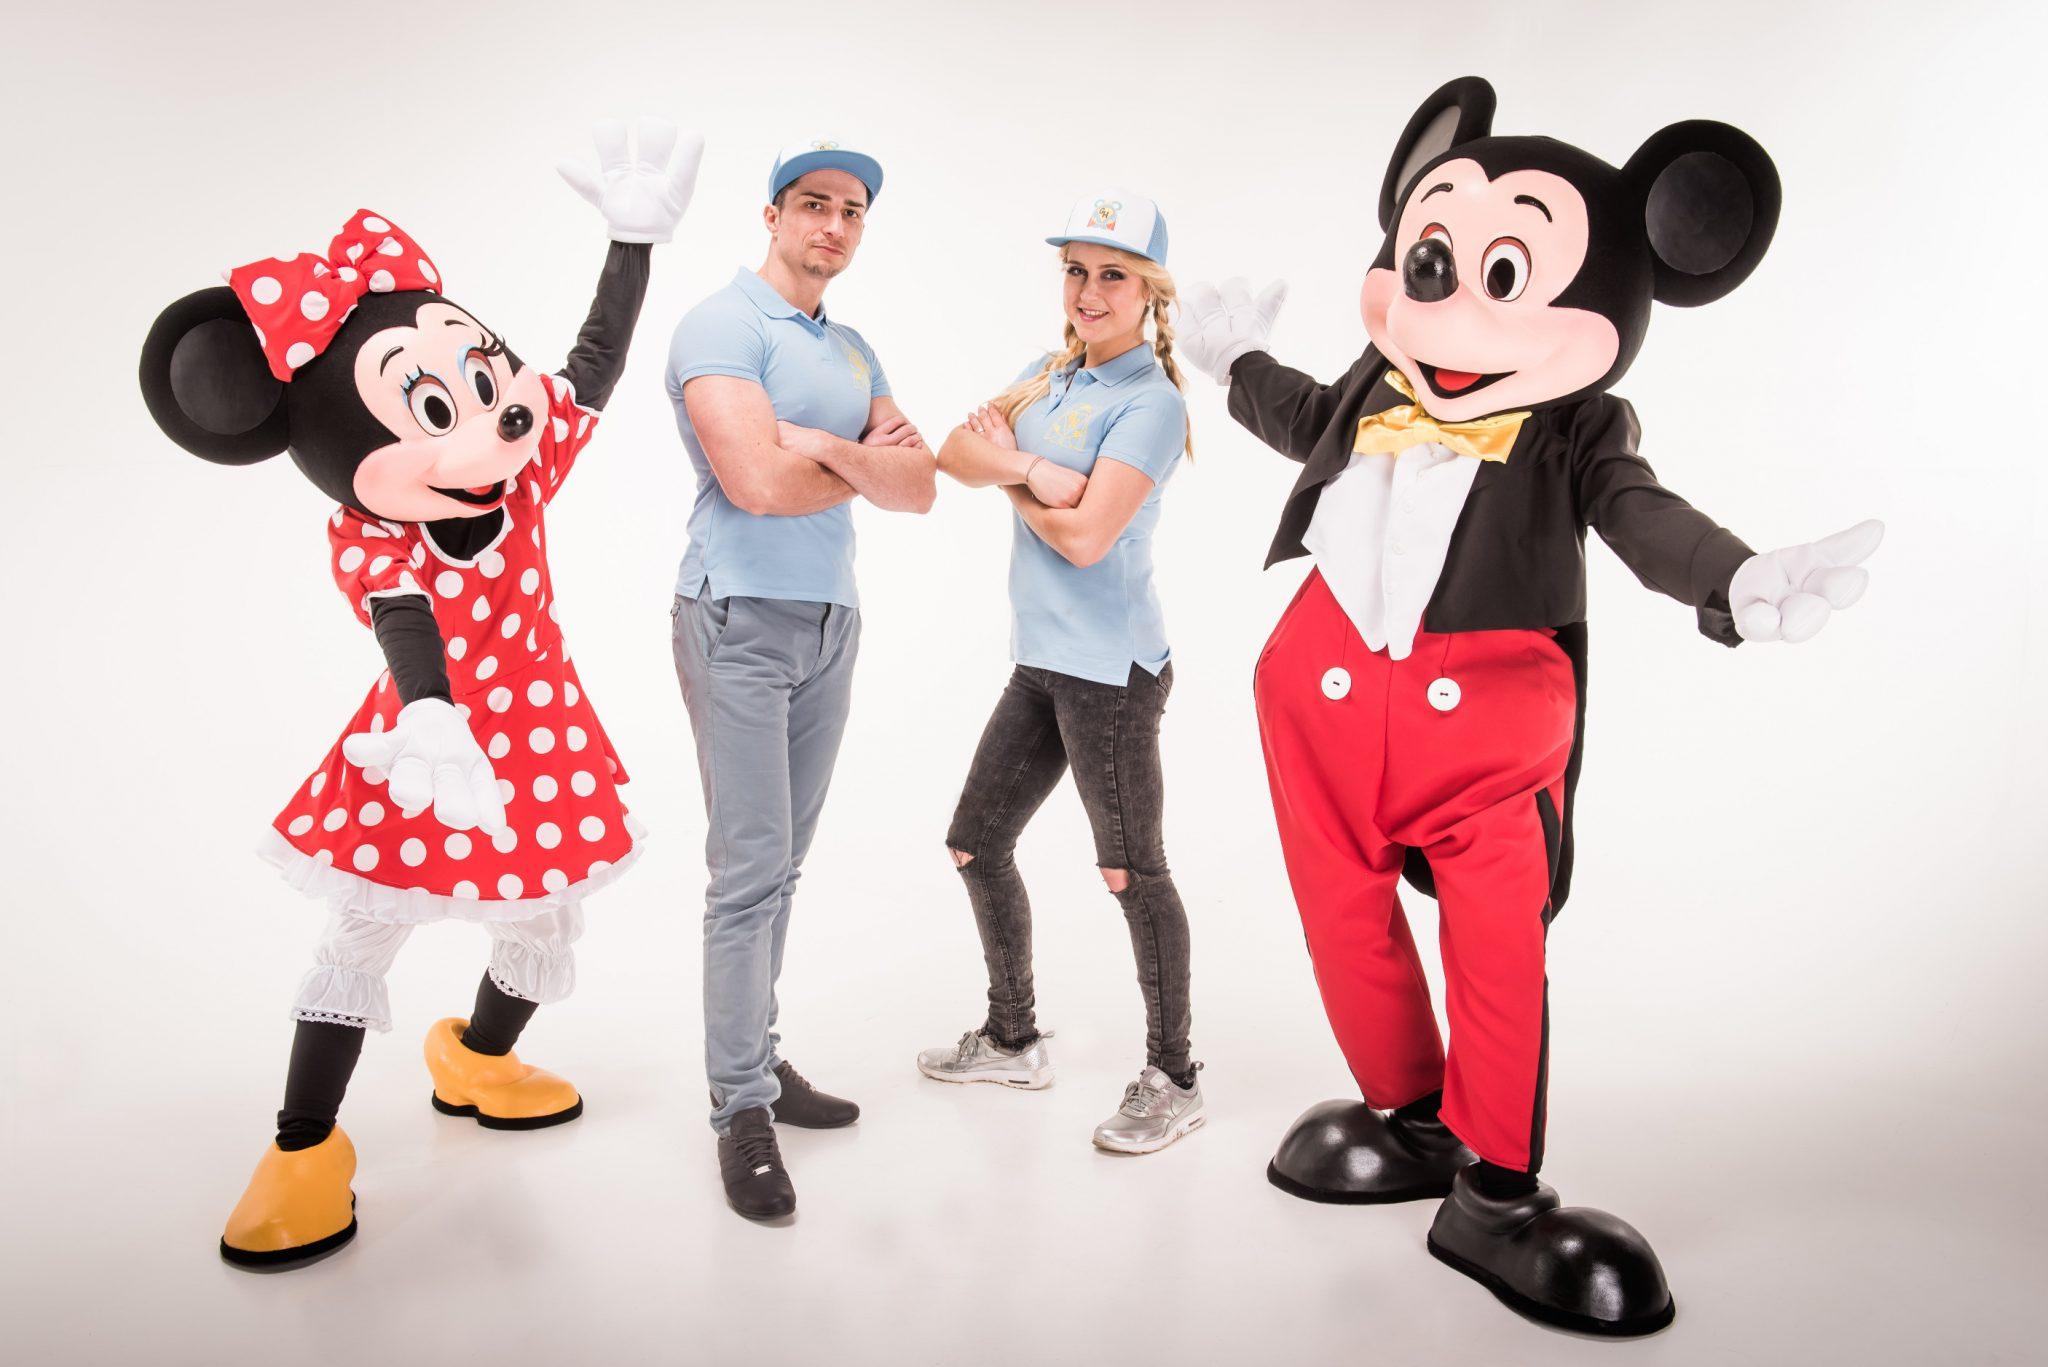 Mickey Mouse Minnie Mouse Geburtstagsheldenhelfer